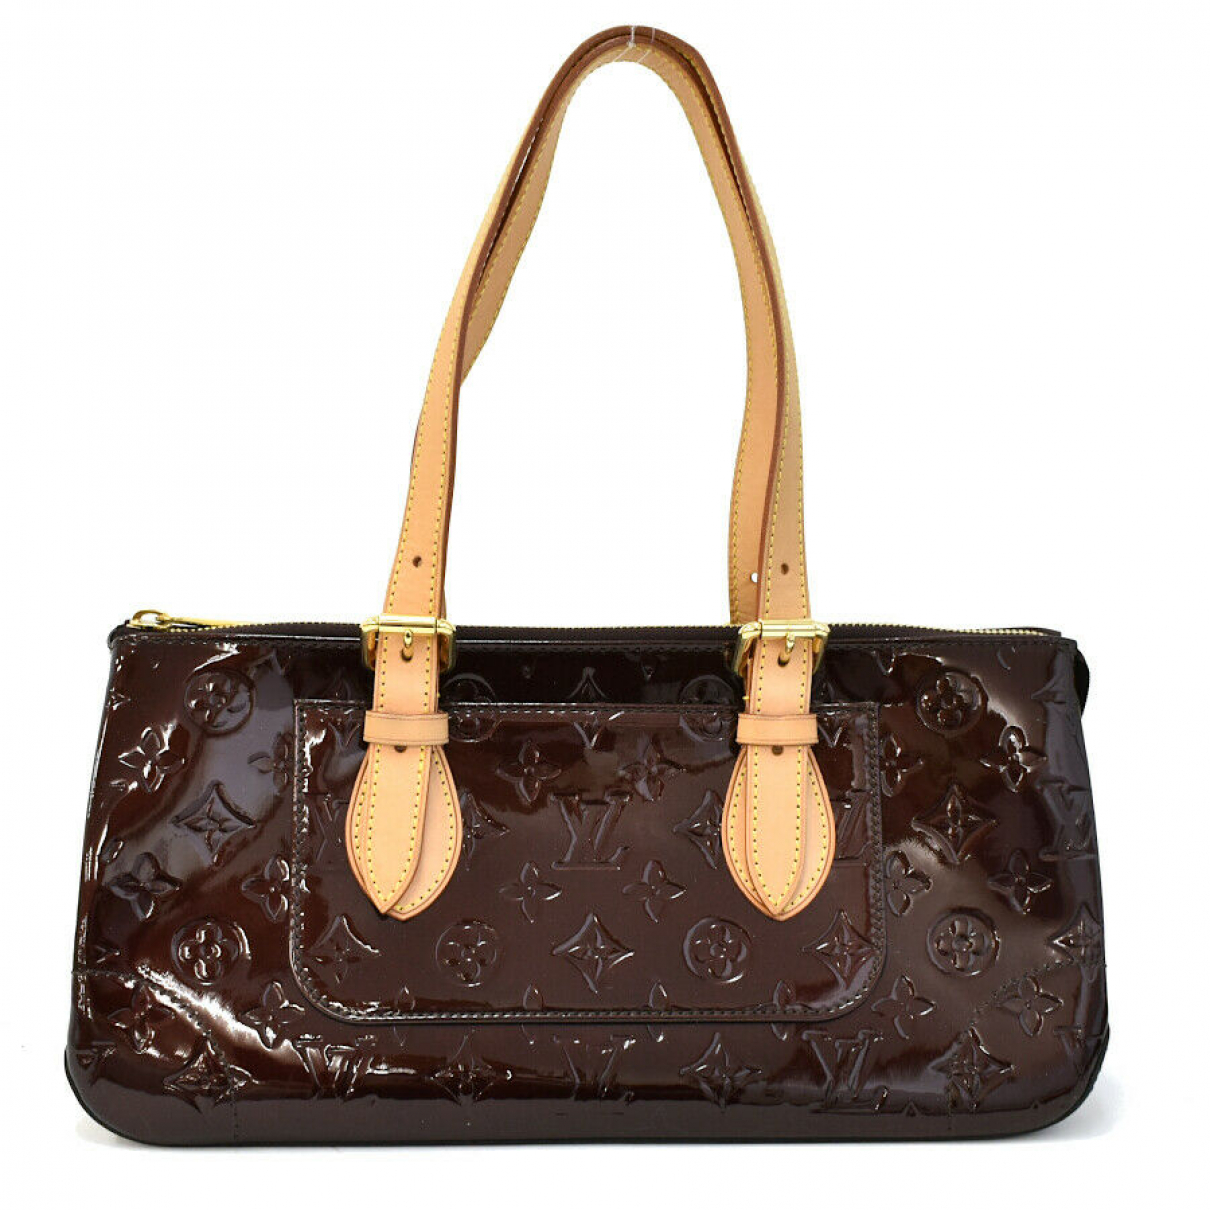 Louis Vuitton N Patent leather handbag for Women N